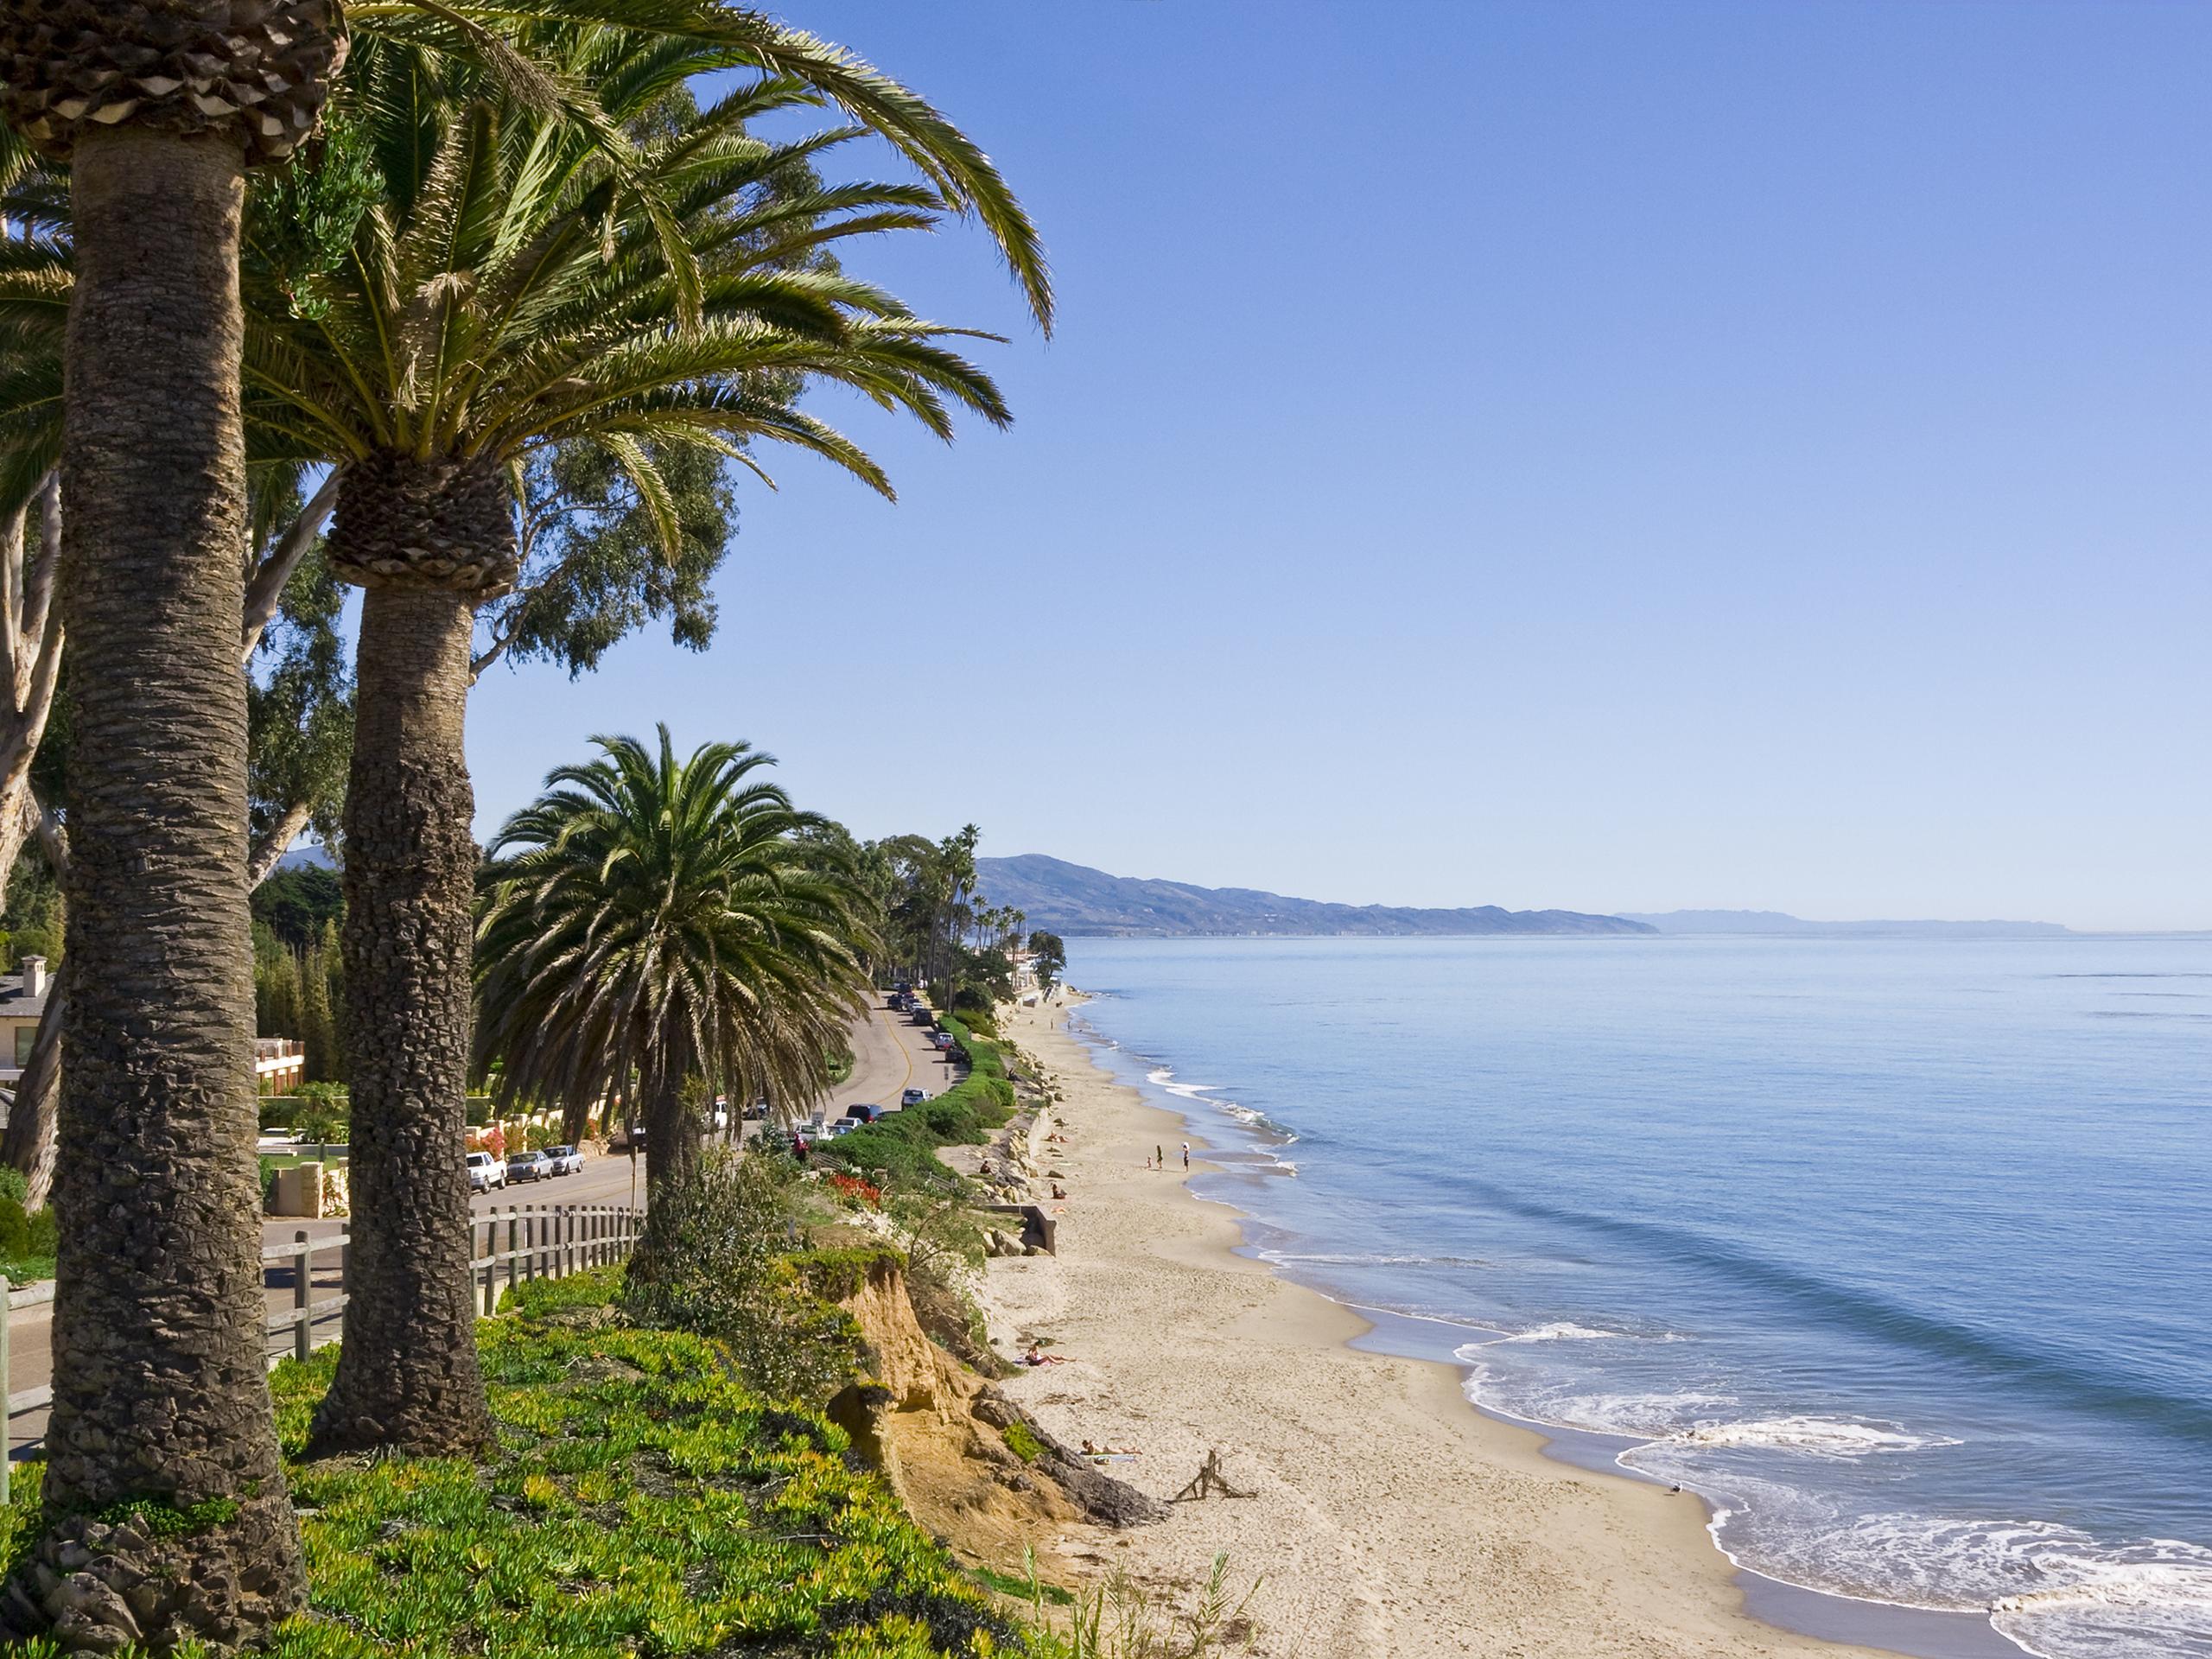 Santa Barbara. Download Wallpaper Toggle Dropdown. 4.69 MP ...